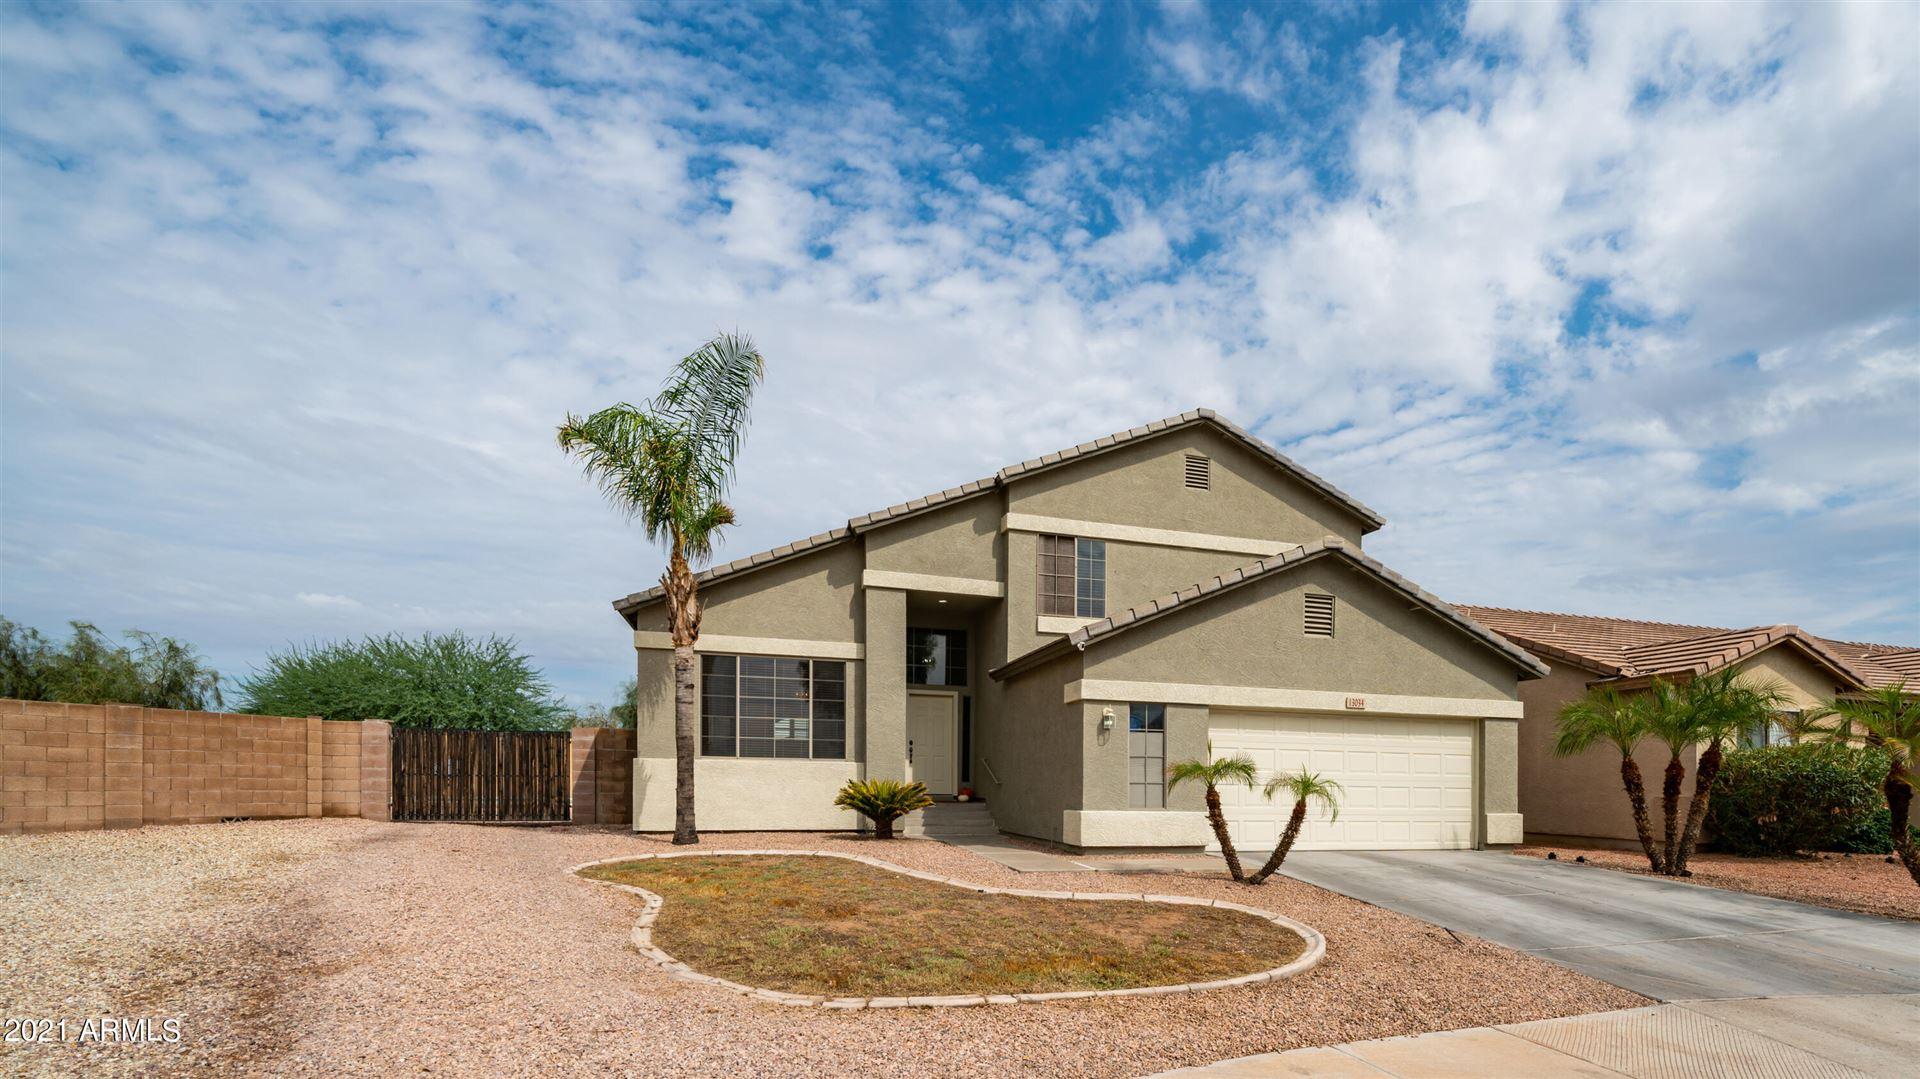 Photo of 13034 W ASH Street, El Mirage, AZ 85335 (MLS # 6300158)